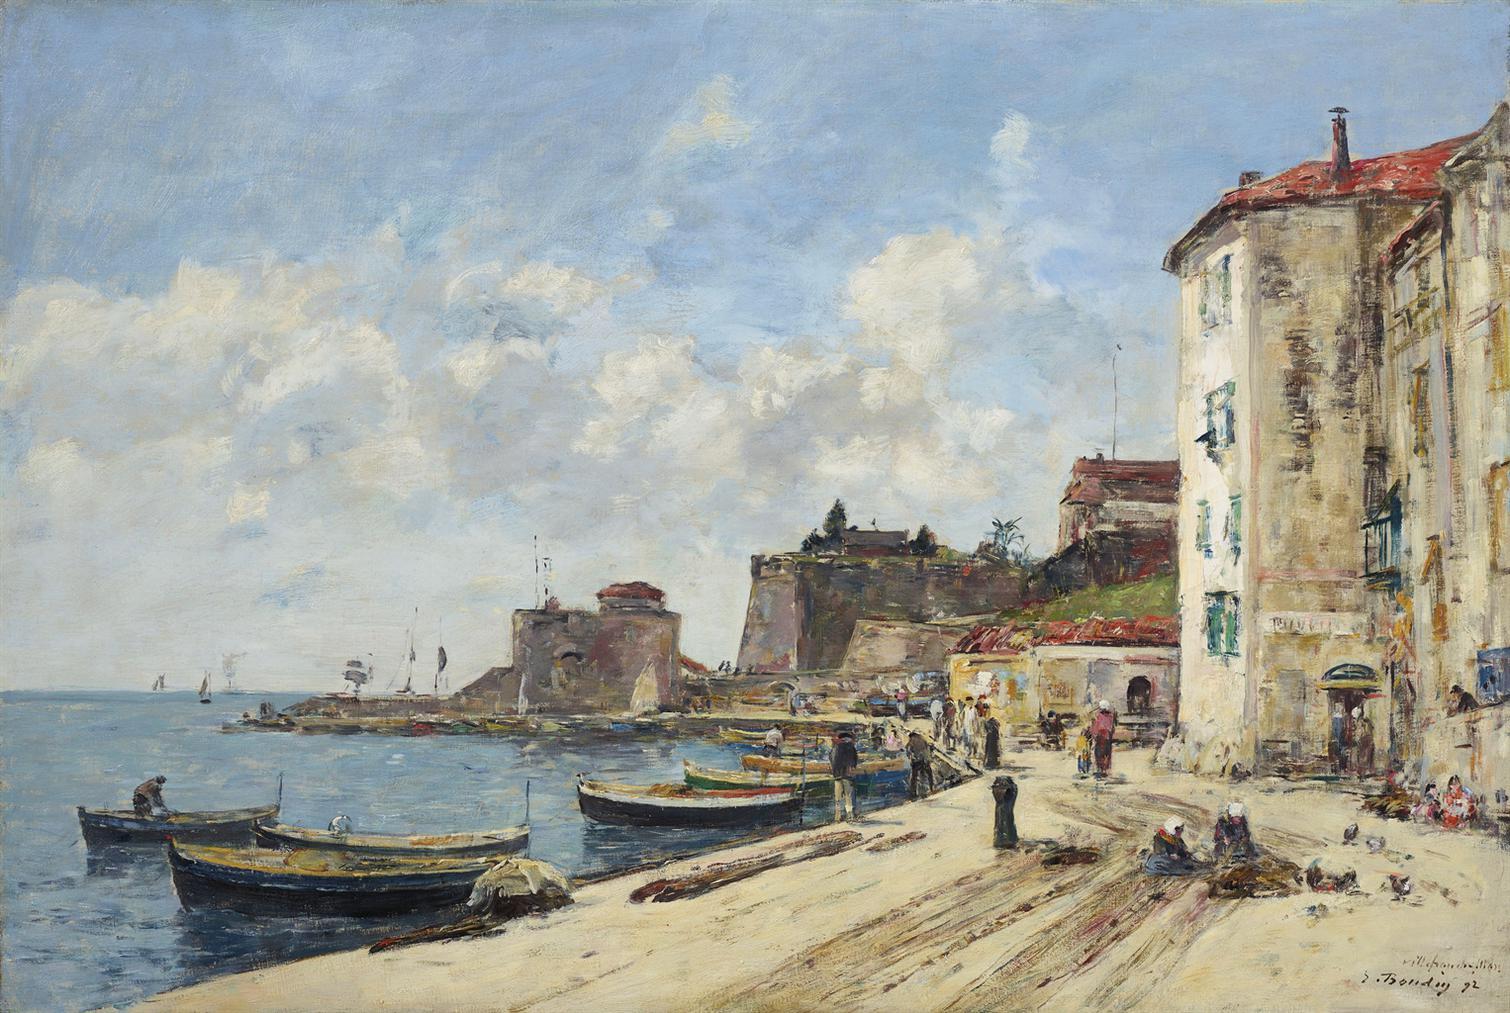 Eugene Louis Boudin-Villefranche, Le Port-1892